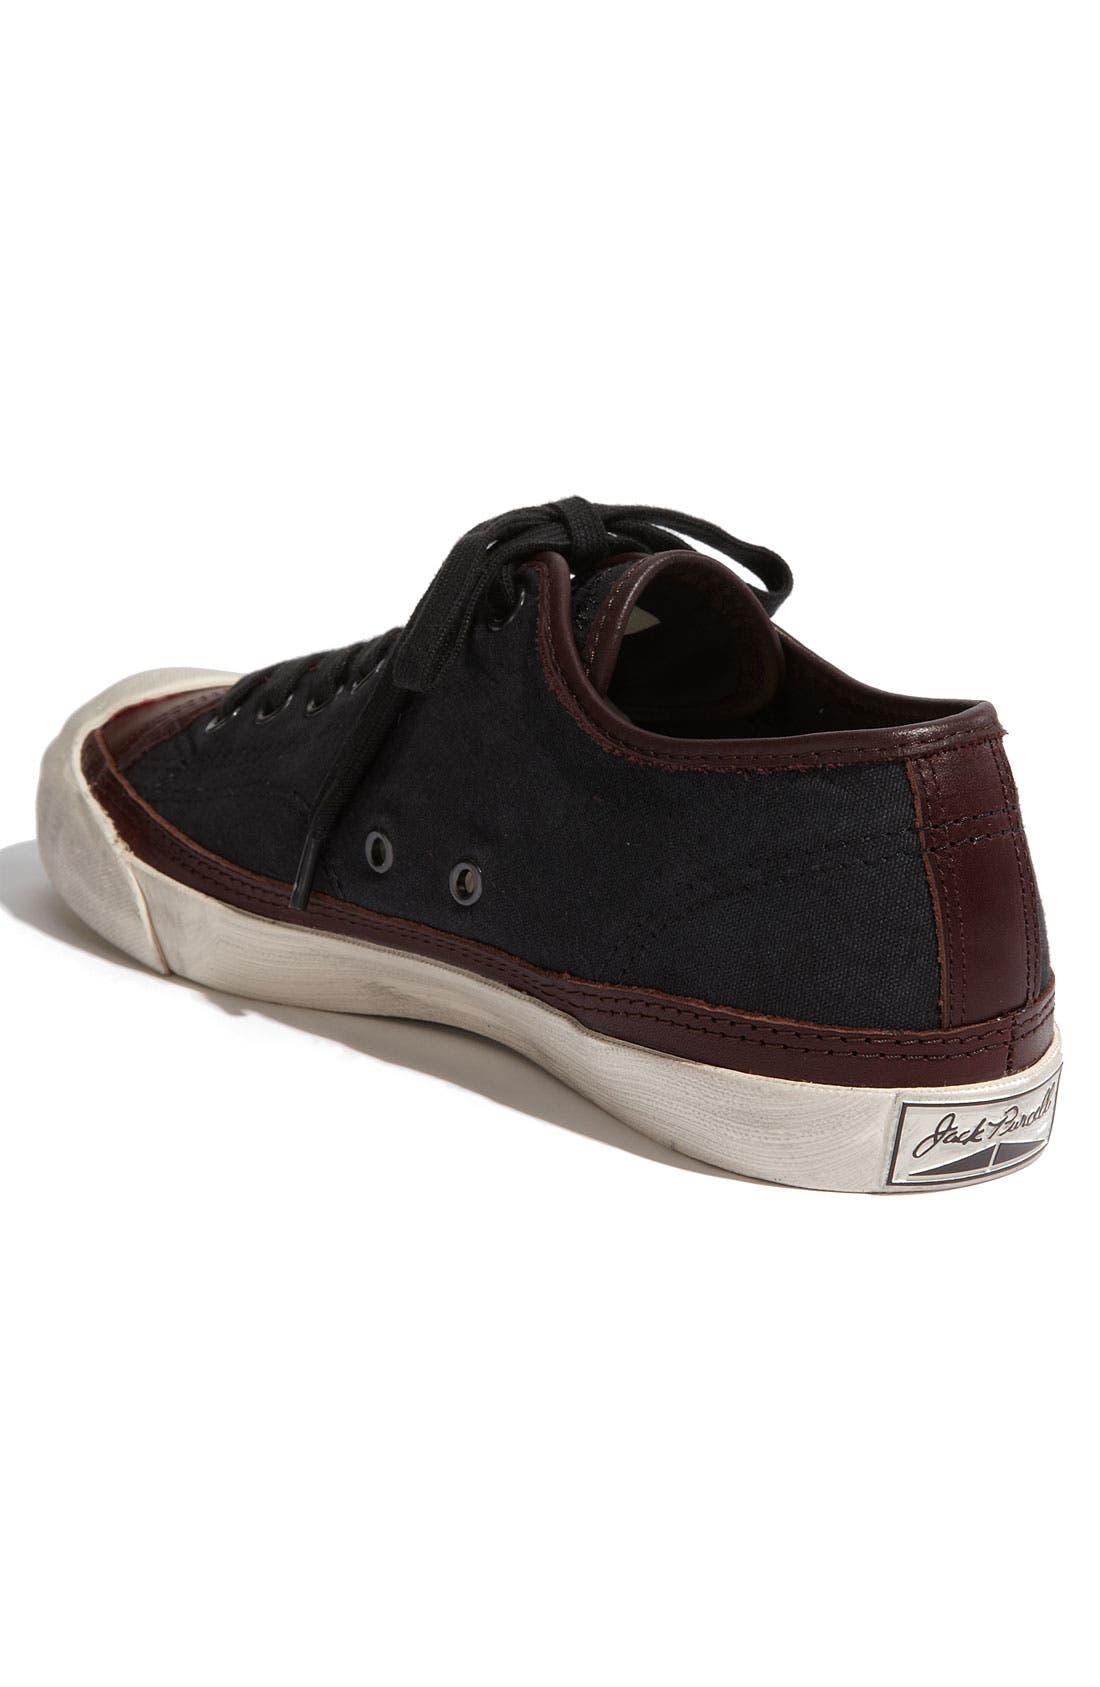 Alternate Image 2  - Converse by John Varvatos 'Jack Purcell Vintage' Sneaker (Men)